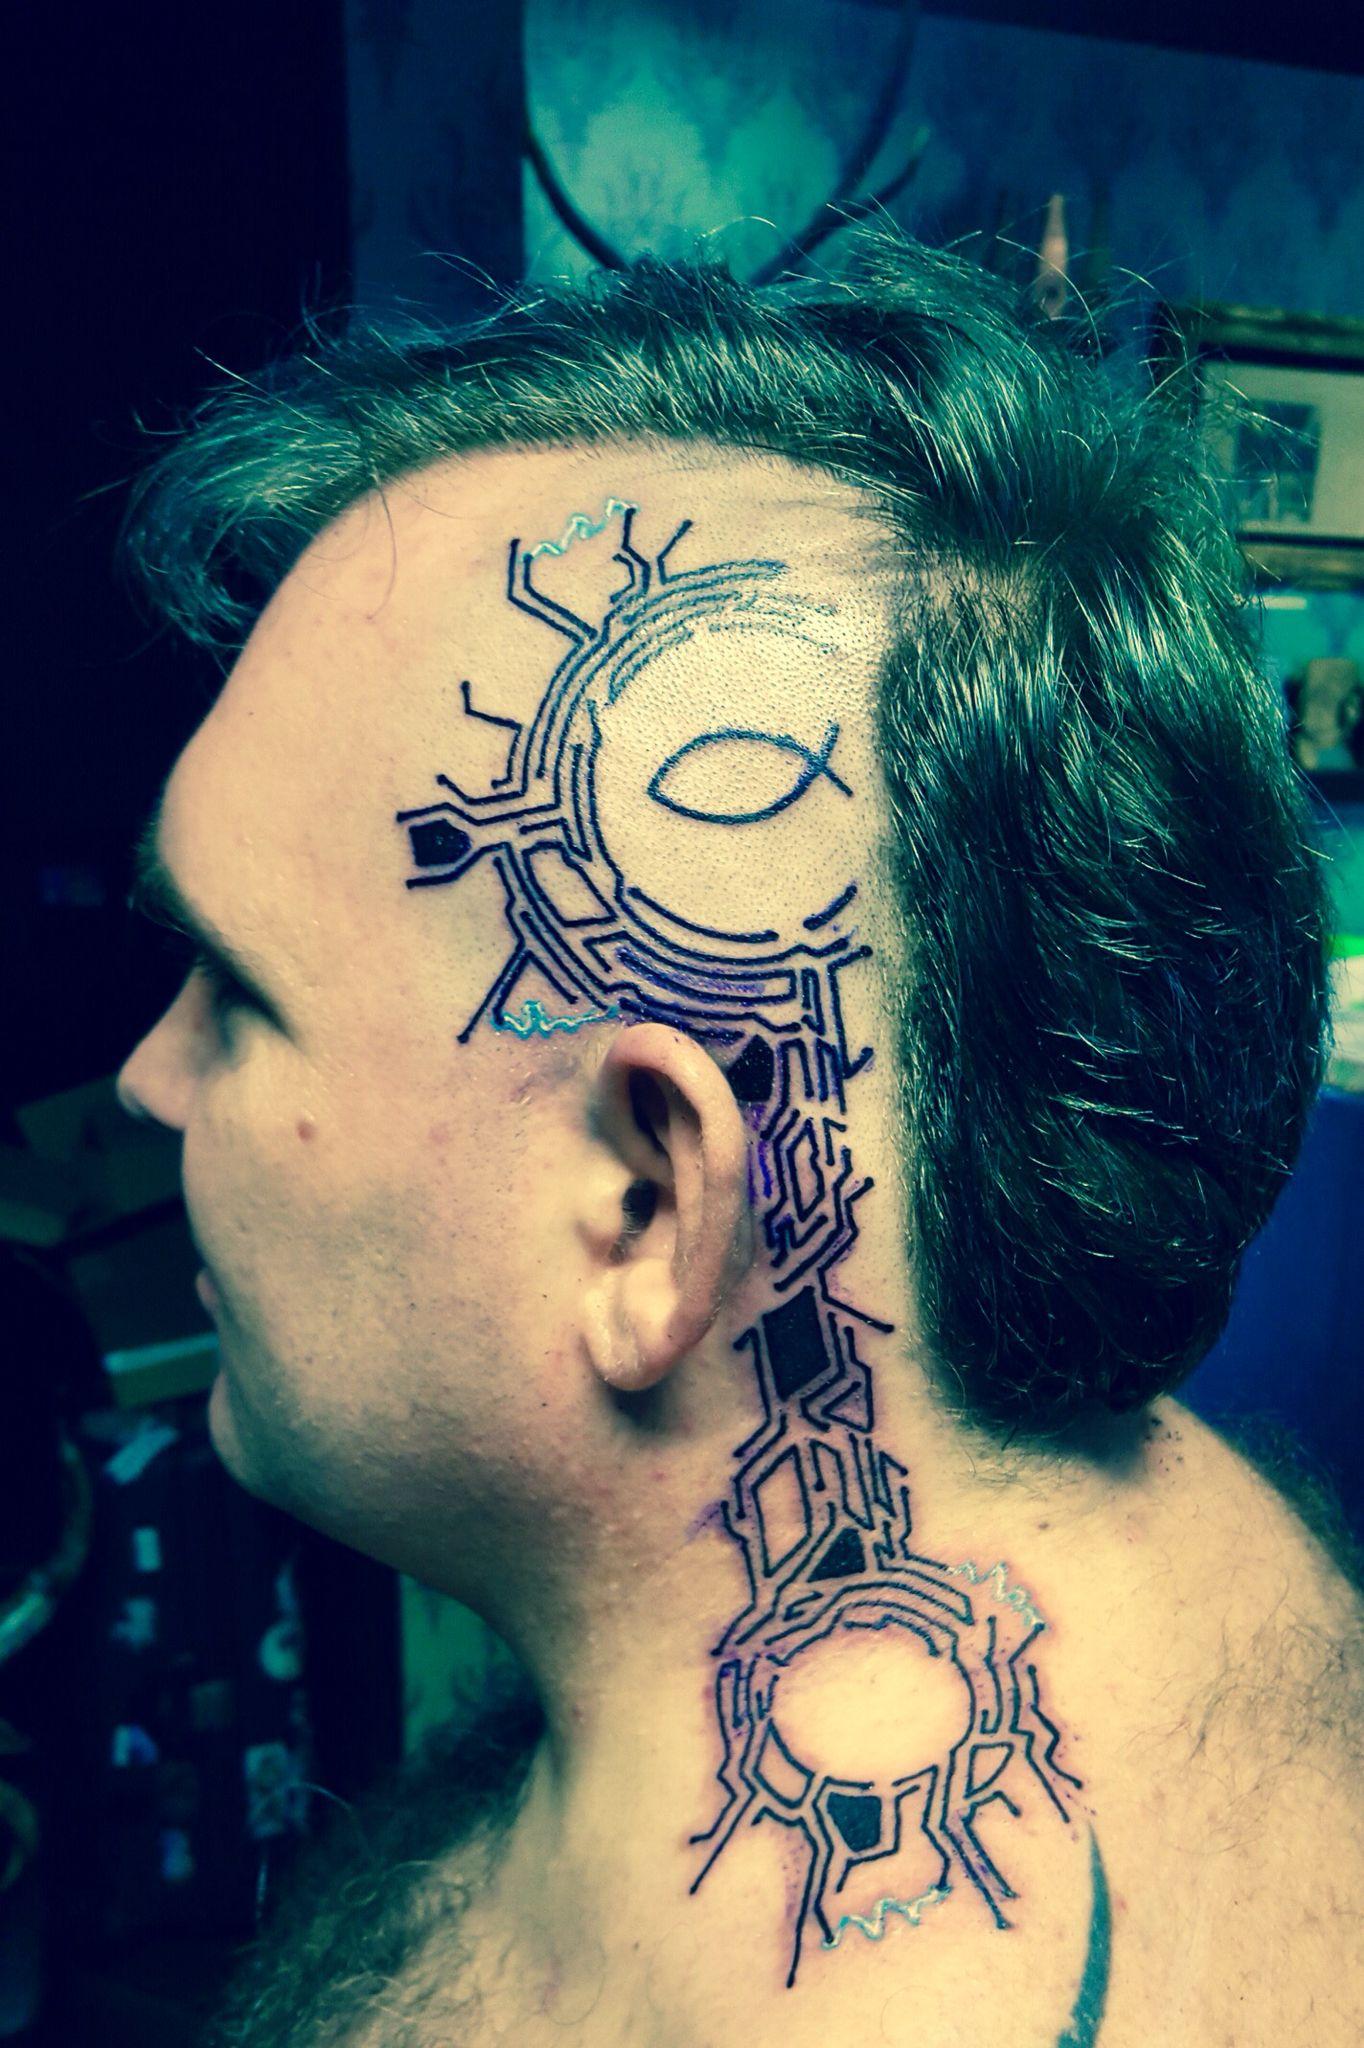 cyberpunk tattoo on head cyborg tattoo cyberpunk tattoo schaltkreise am kopf circuit. Black Bedroom Furniture Sets. Home Design Ideas